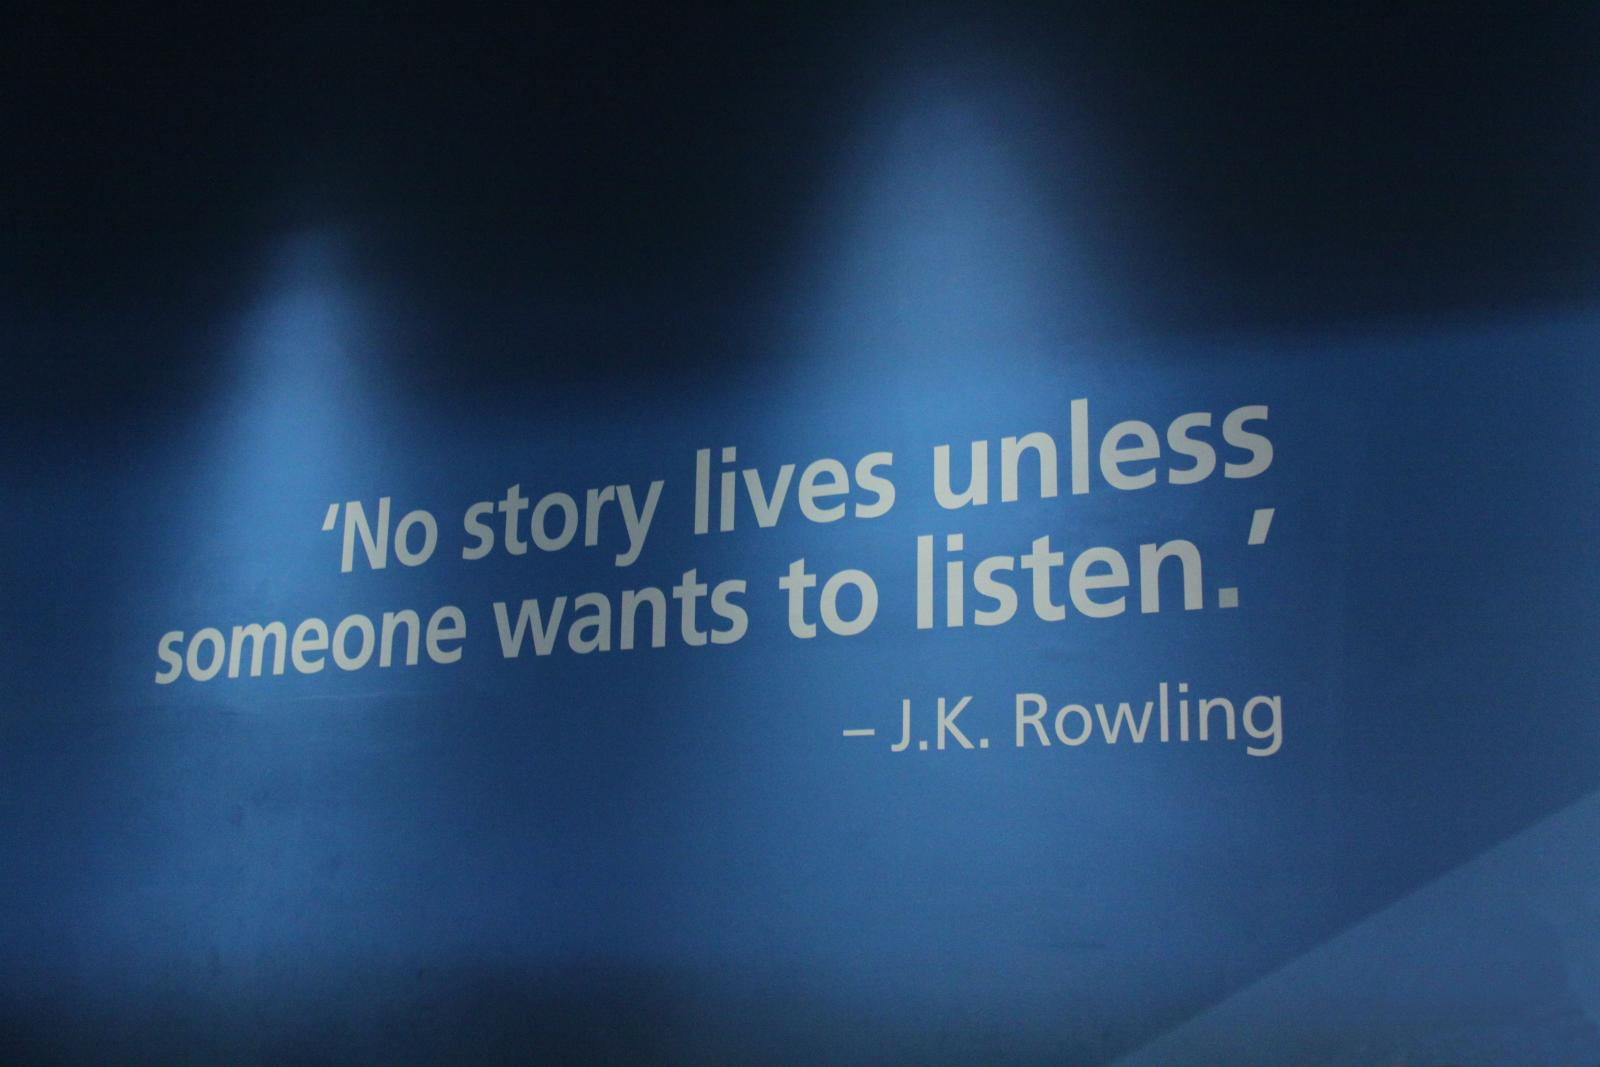 Auto-édités : Dave Catchpole - The Making of Harry Potter